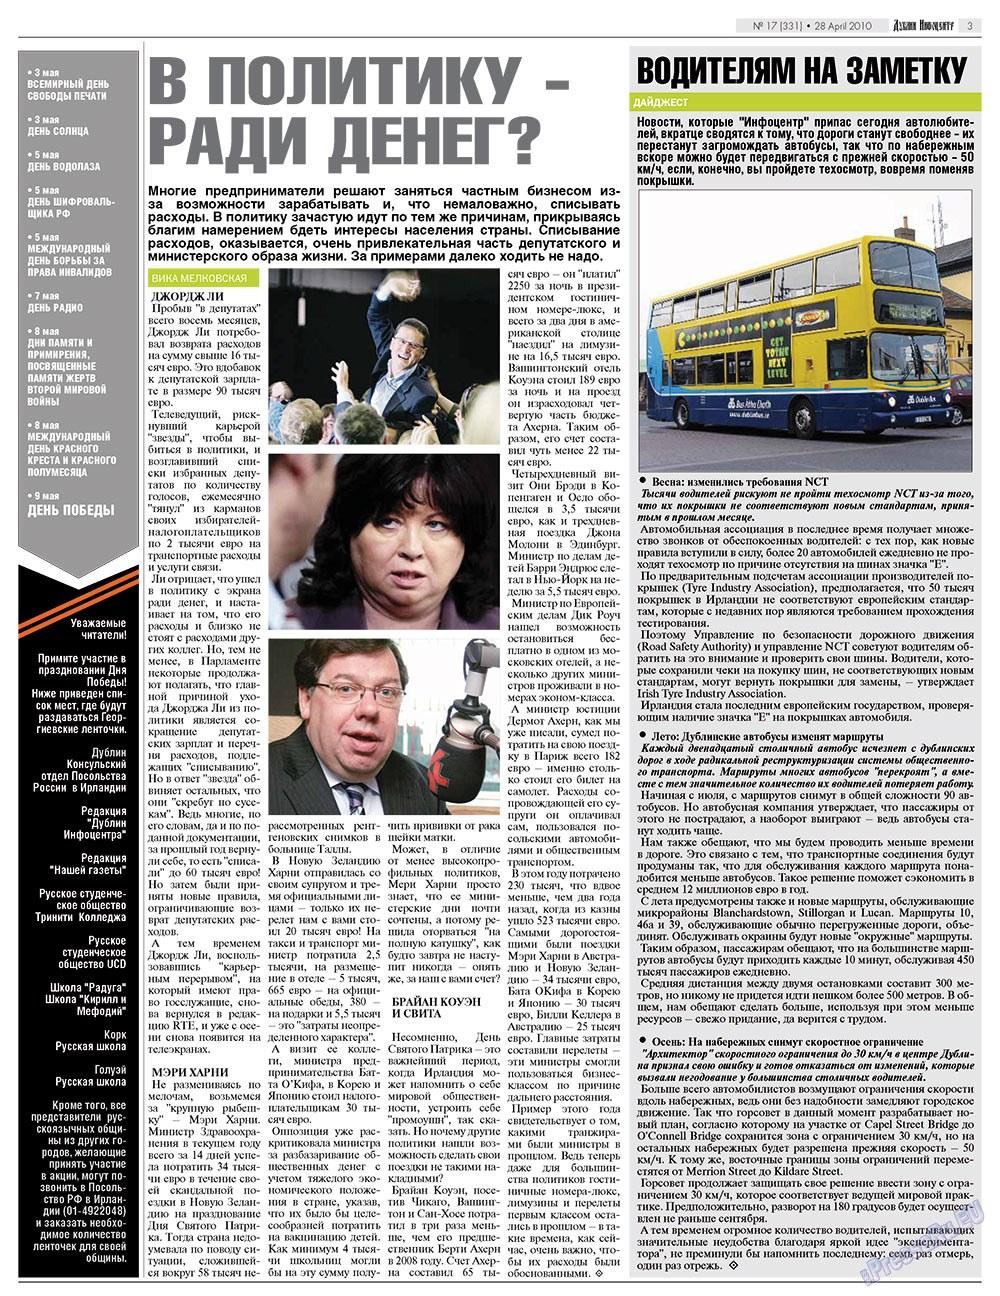 Дублин инфоцентр (газета). 2010 год, номер 17, стр. 3